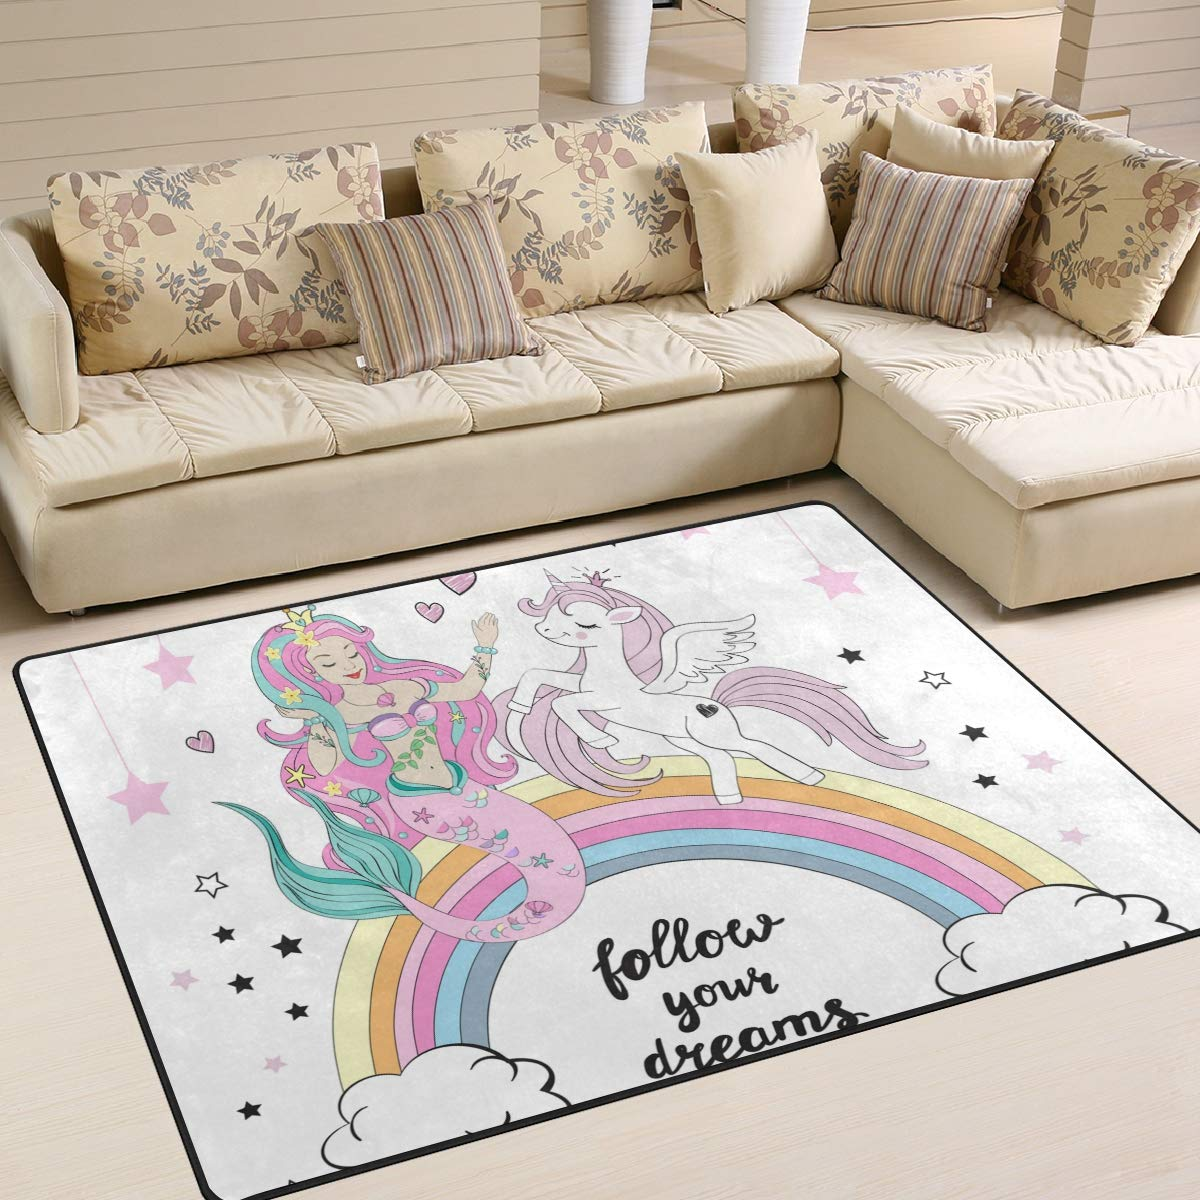 Orediy Soft Rugs Unicorn And Mermaid Lightweight Area Rugs Kids Playing Floor Mat Non Slip Yoga Nursery Rug for Living Room Bedroom